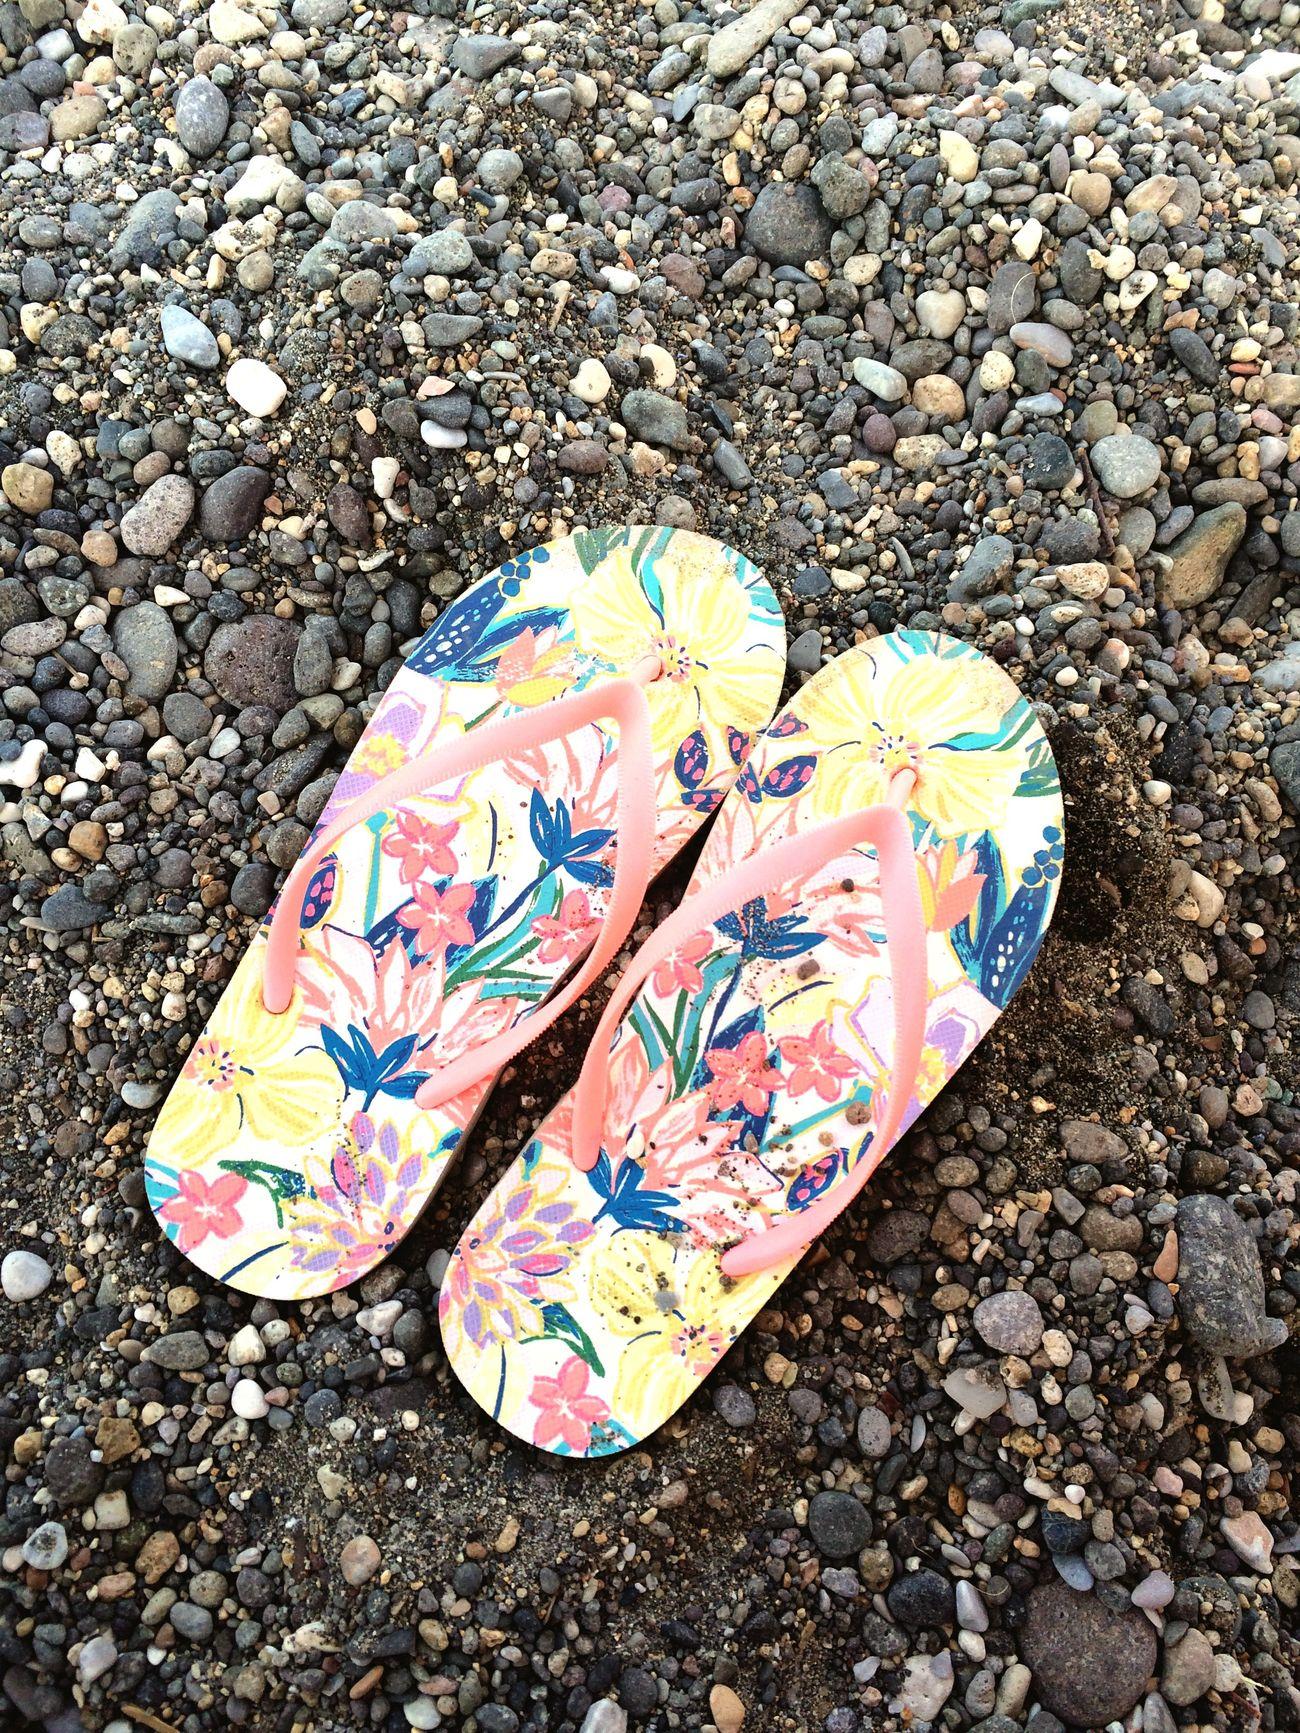 👣🕶🌞🍺🏊🏻🏖 Summer #summertime #sun #TagsForLikes.com #hot #sunny #warm #fun #beautiful #sky #clearskys #season #seasons #instagood #instasummer #photooftheday #nature #TFLers #clearsky #bluesky #vacationtime #weather #summerweather #sunshine #summertimeshine Eyem Best Shots Eyemphotography Sea And Sky Sea Bodrum, Turkey Holiday Good Times